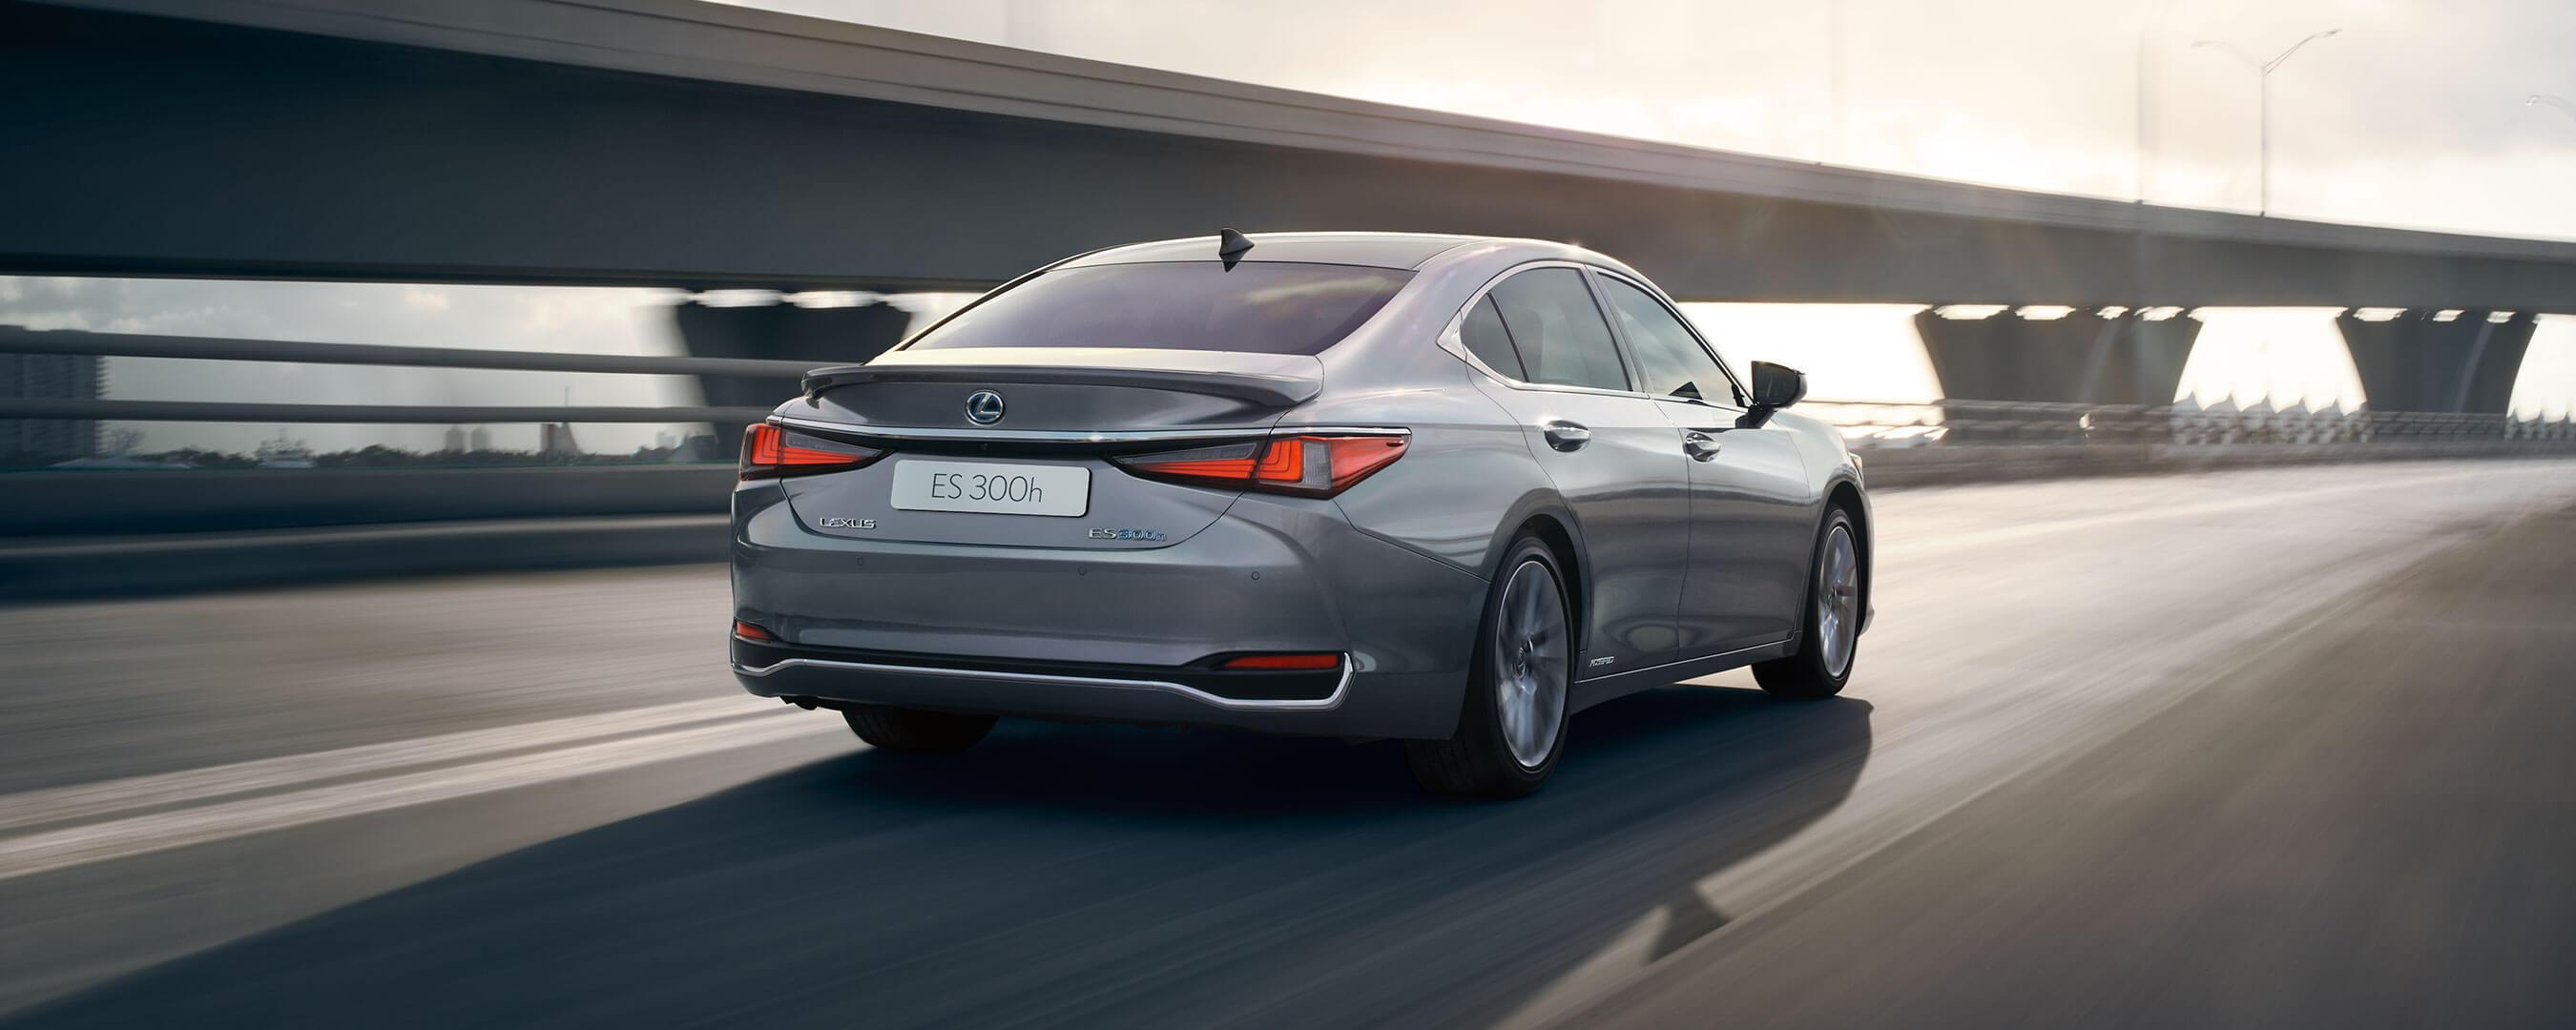 2019 Lexus Es Hybrid Experience Hero Exterior Back